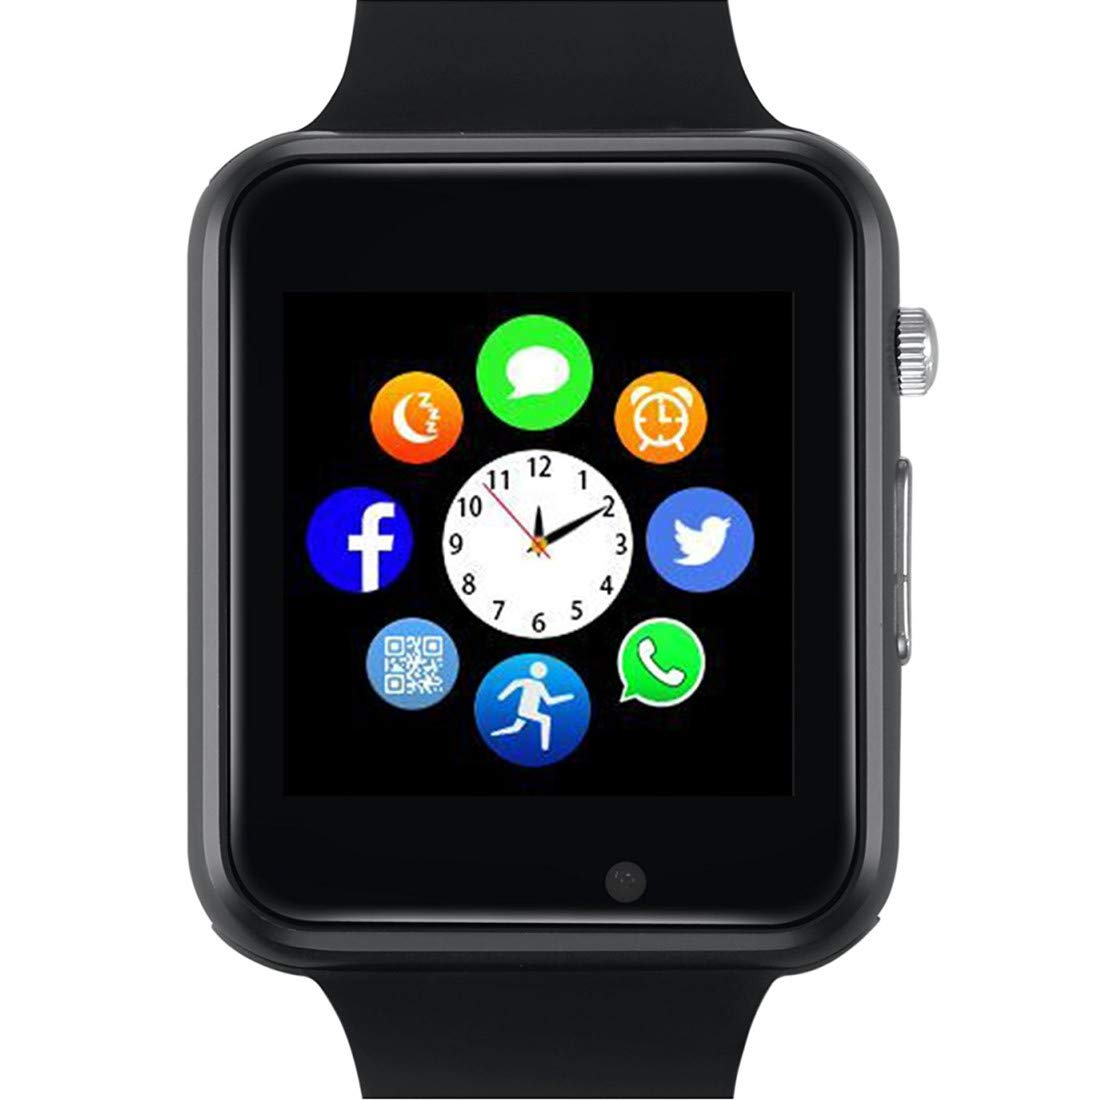 Smart Watch - YIIXIIYN Bluetooth Smart Watch Sport Fitness Tracker Wrist Watch Touchscreen with Camera SIM SD Card Slot Watch Compatible iPhone iOS Samsung LG Android Women Men Kids (Black)